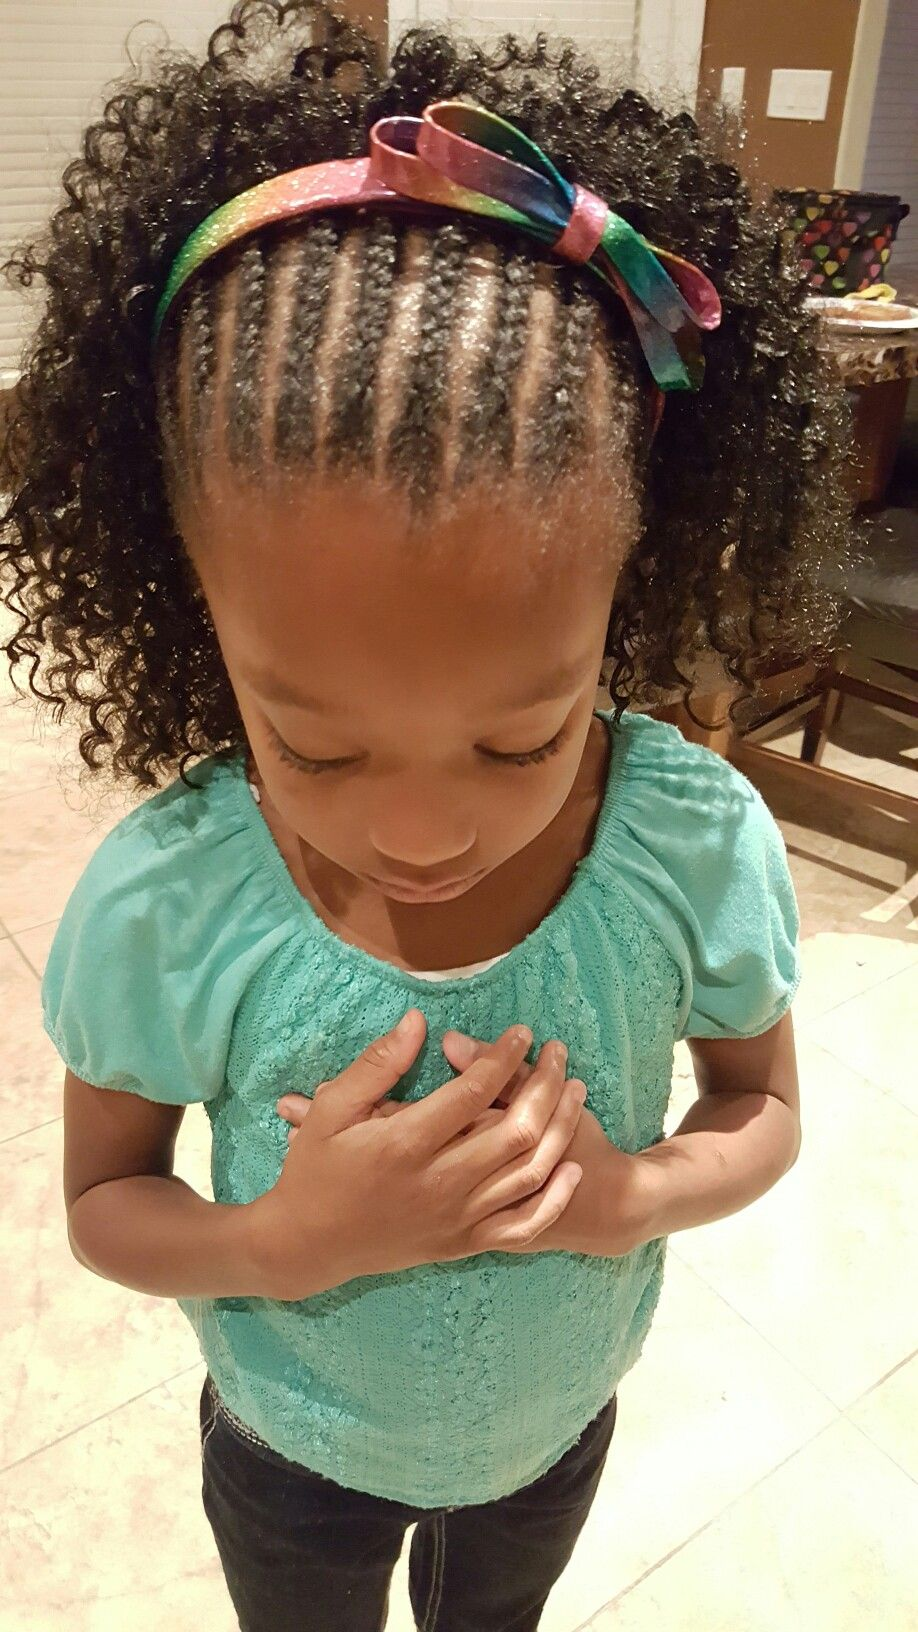 Crochet braids for little girls | crochet styles for little girls | Pinterest | Crochet braid ...